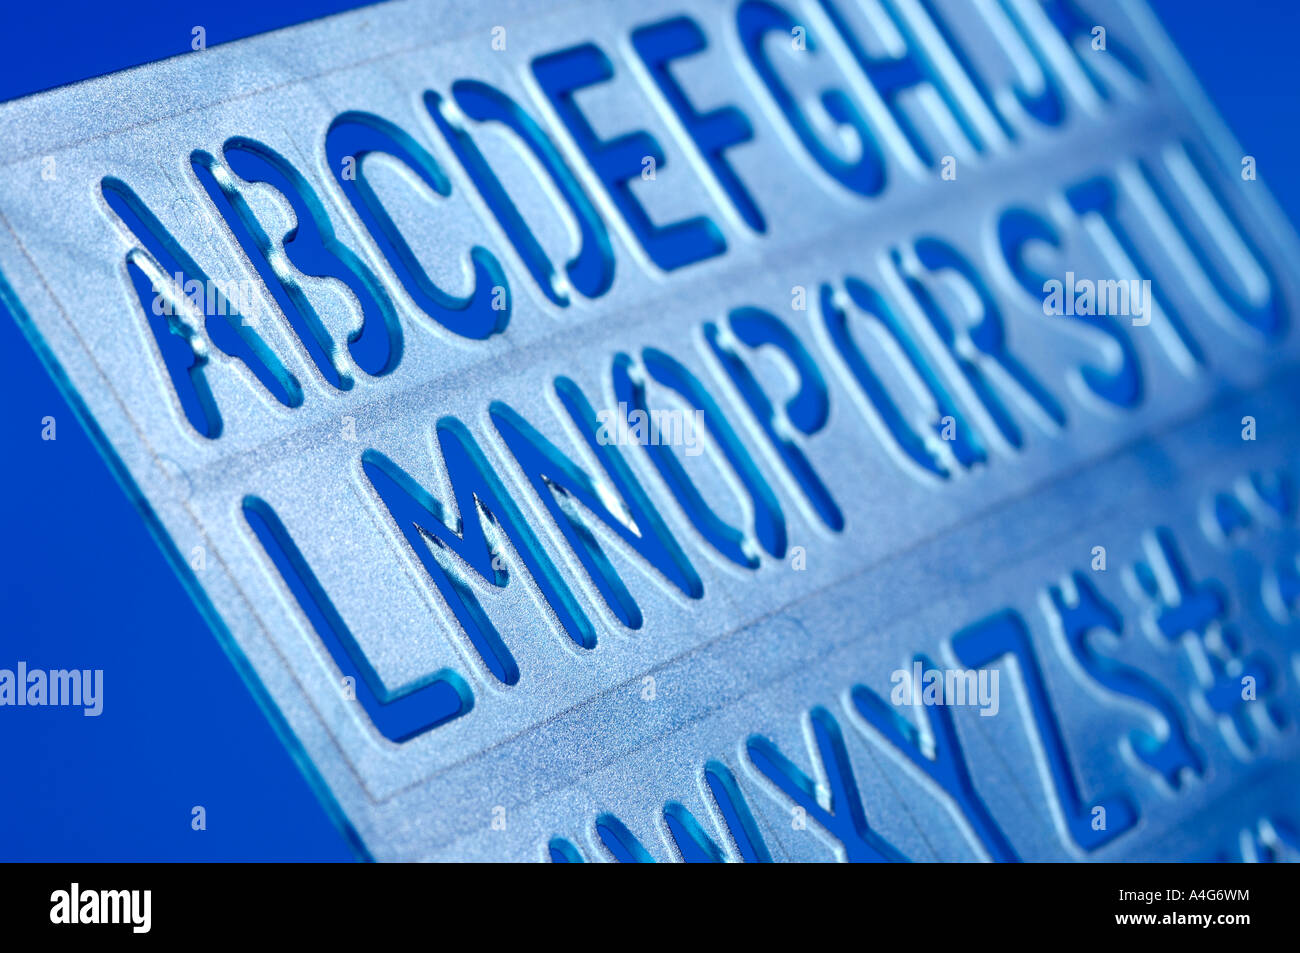 Alphabet stencil - Stock Image